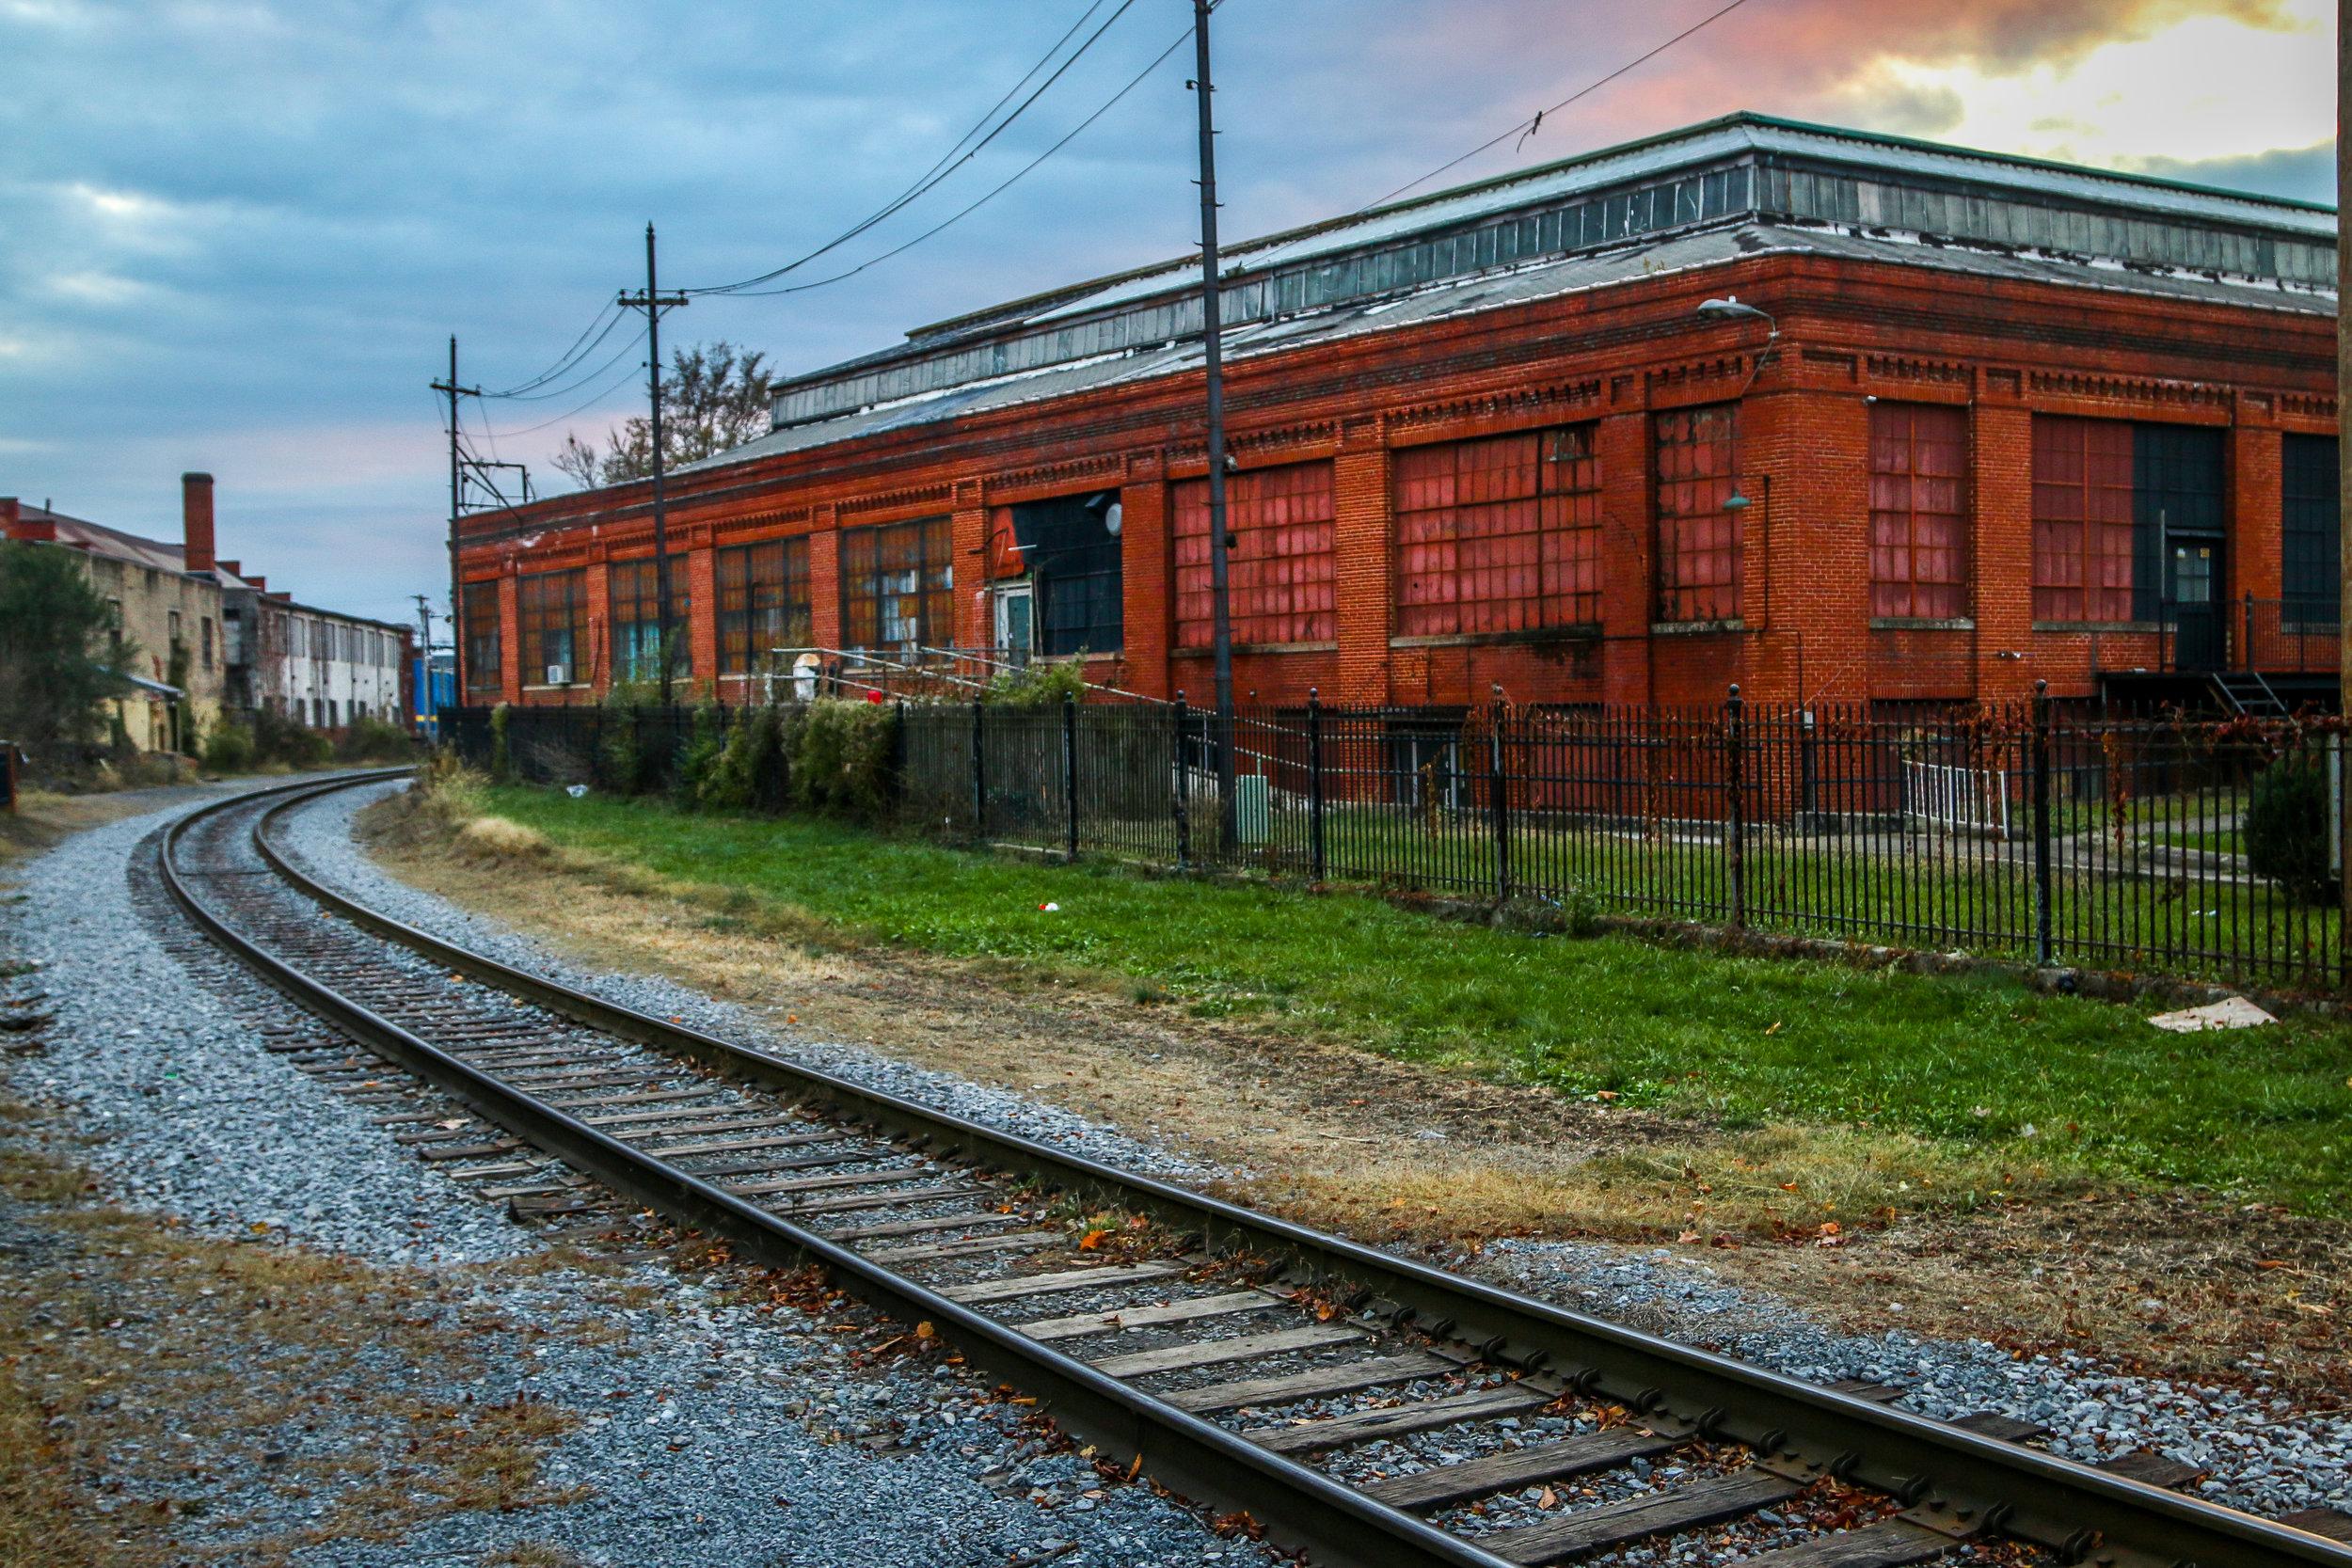 martinsburg-train-tracks.JPG